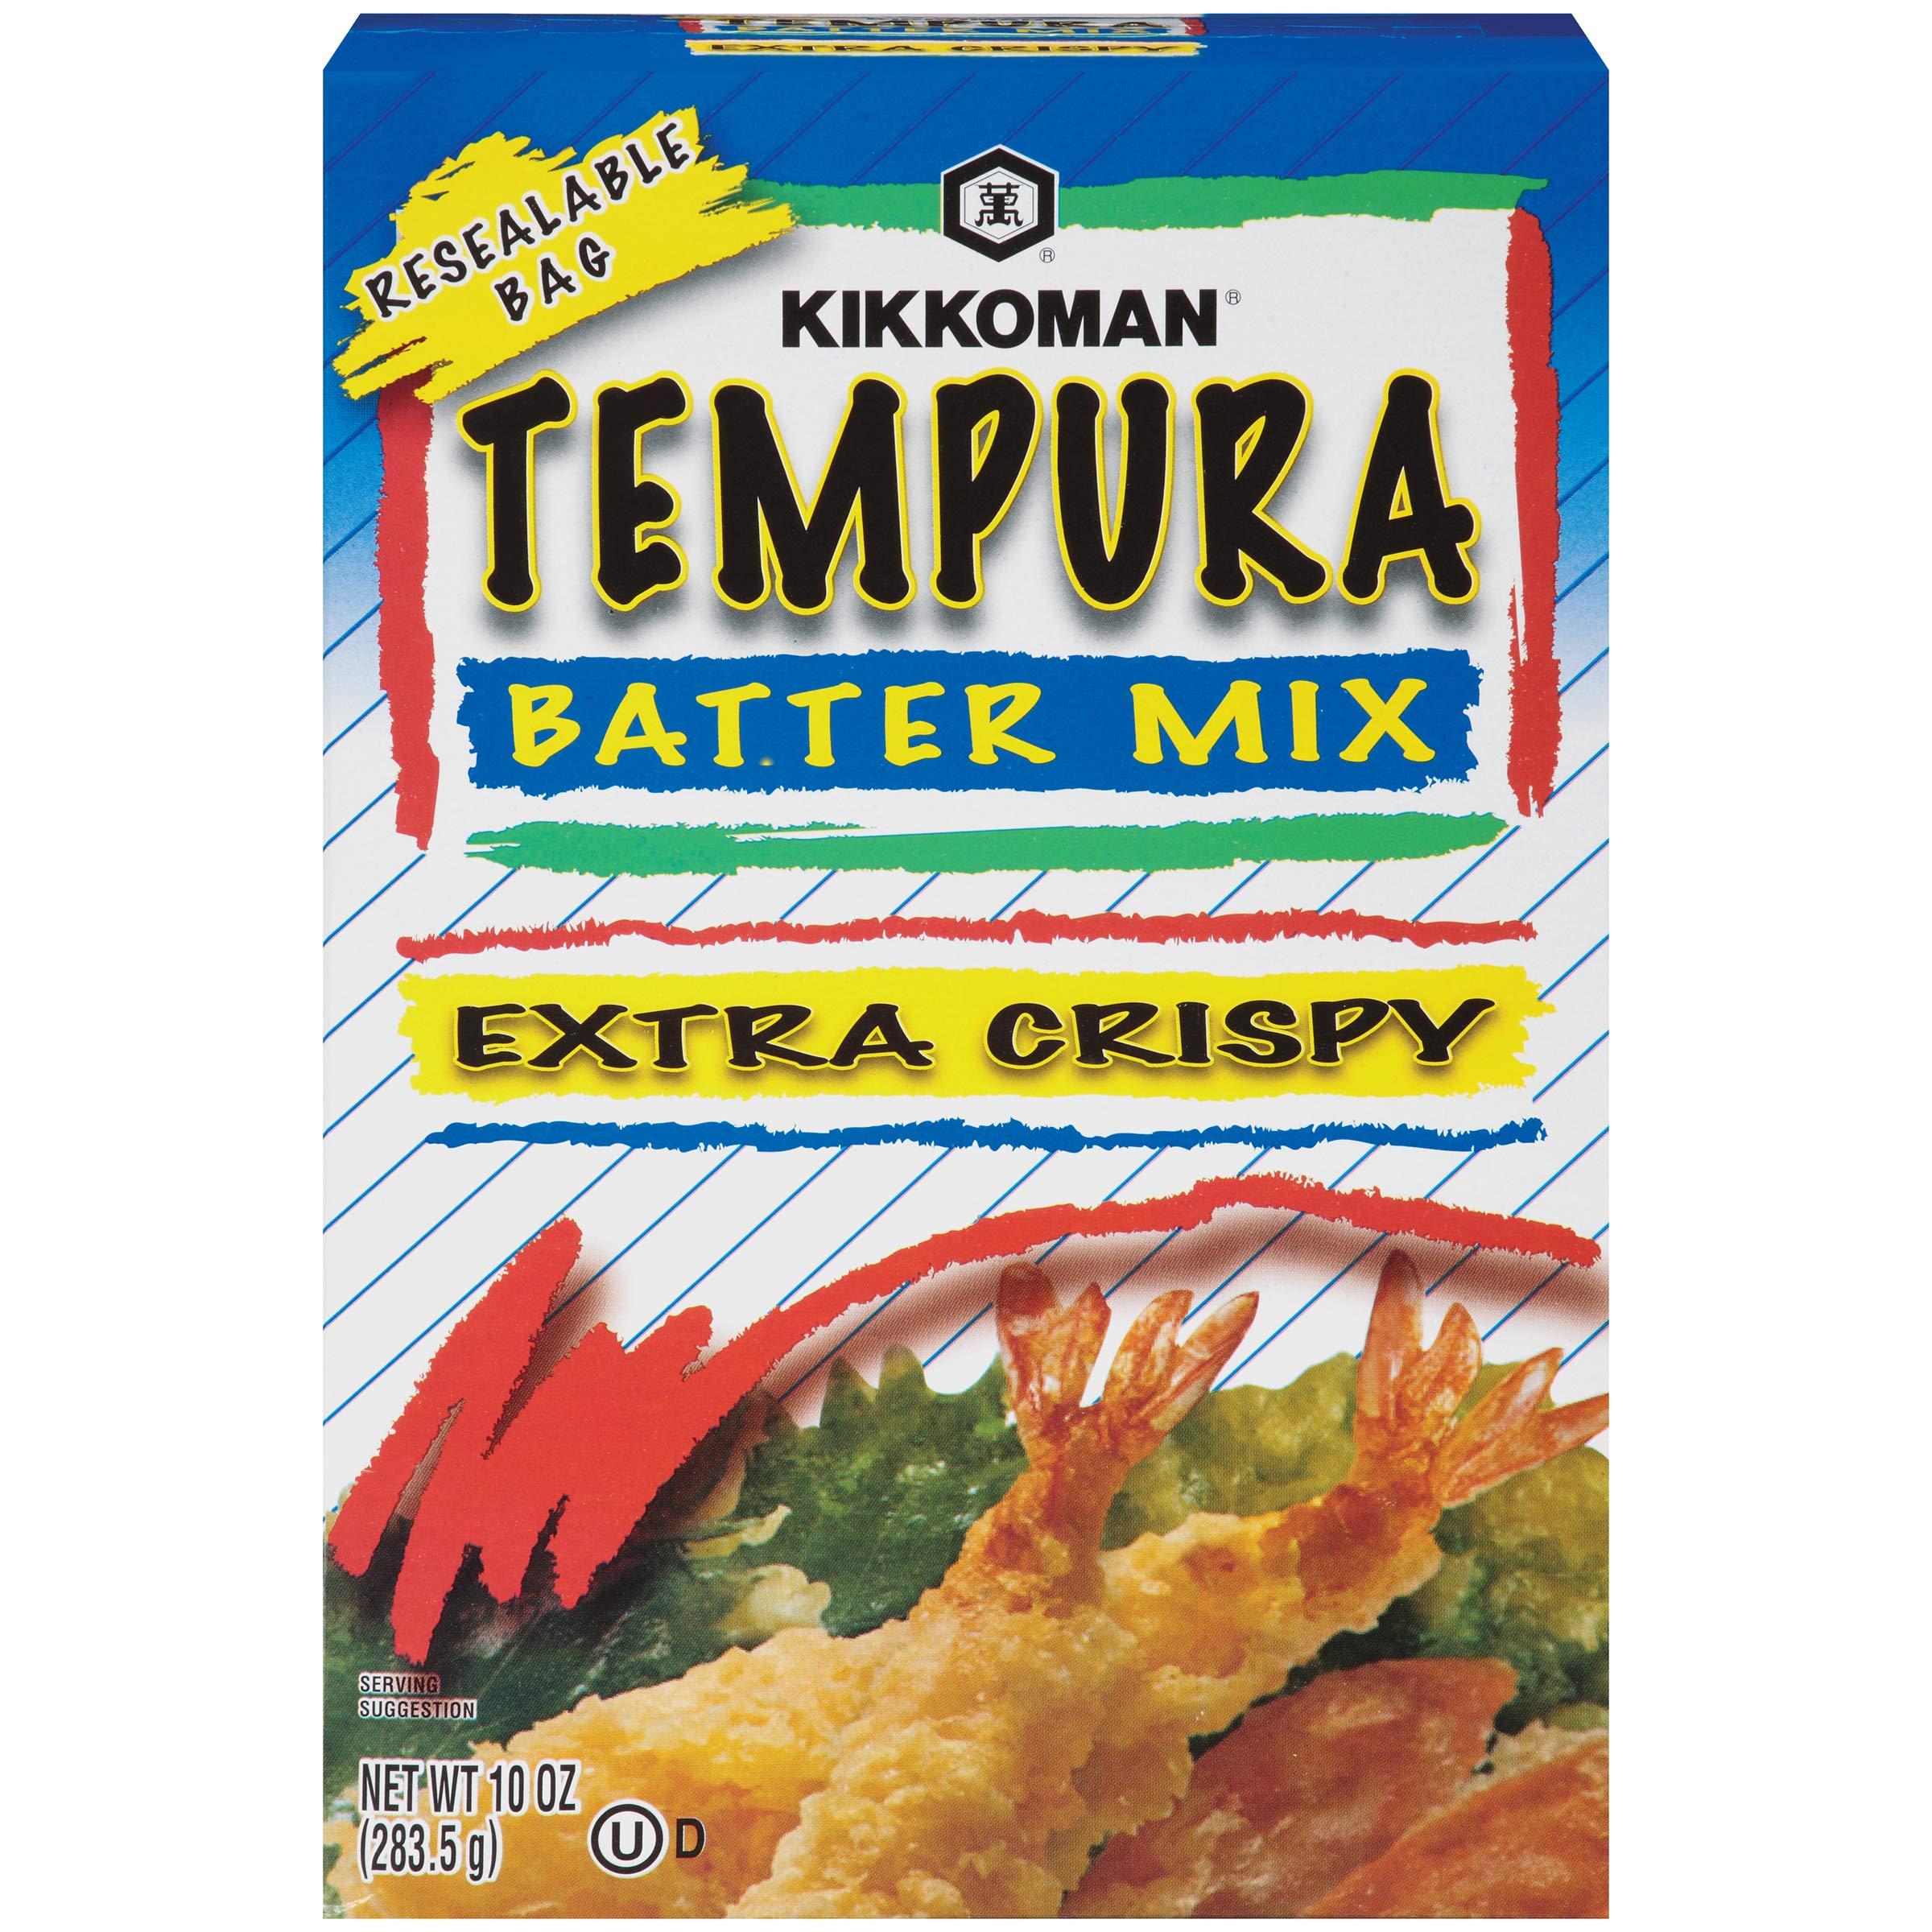 Kikkoman Mix Tempura Batter,Extra crispy, net wt 10 oz,pack of 2 by Kikkoman